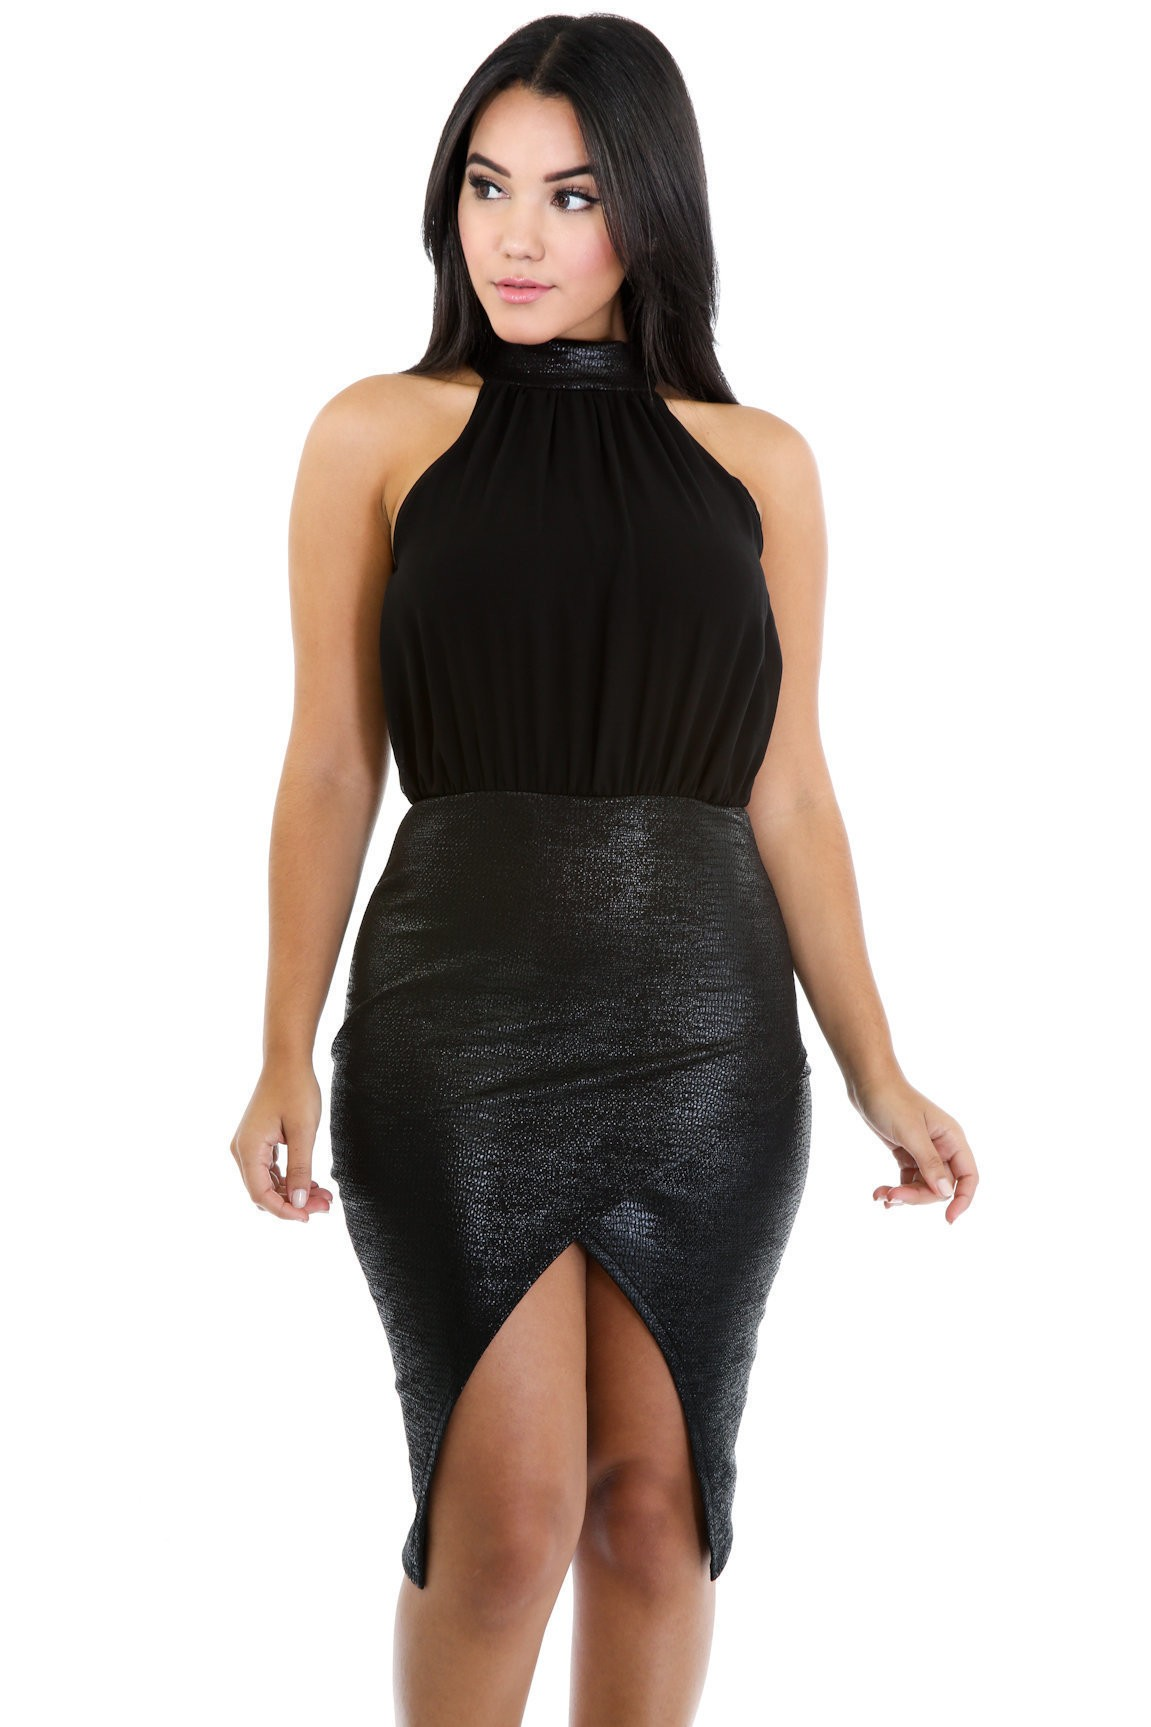 Alligate in Elegancy Dress